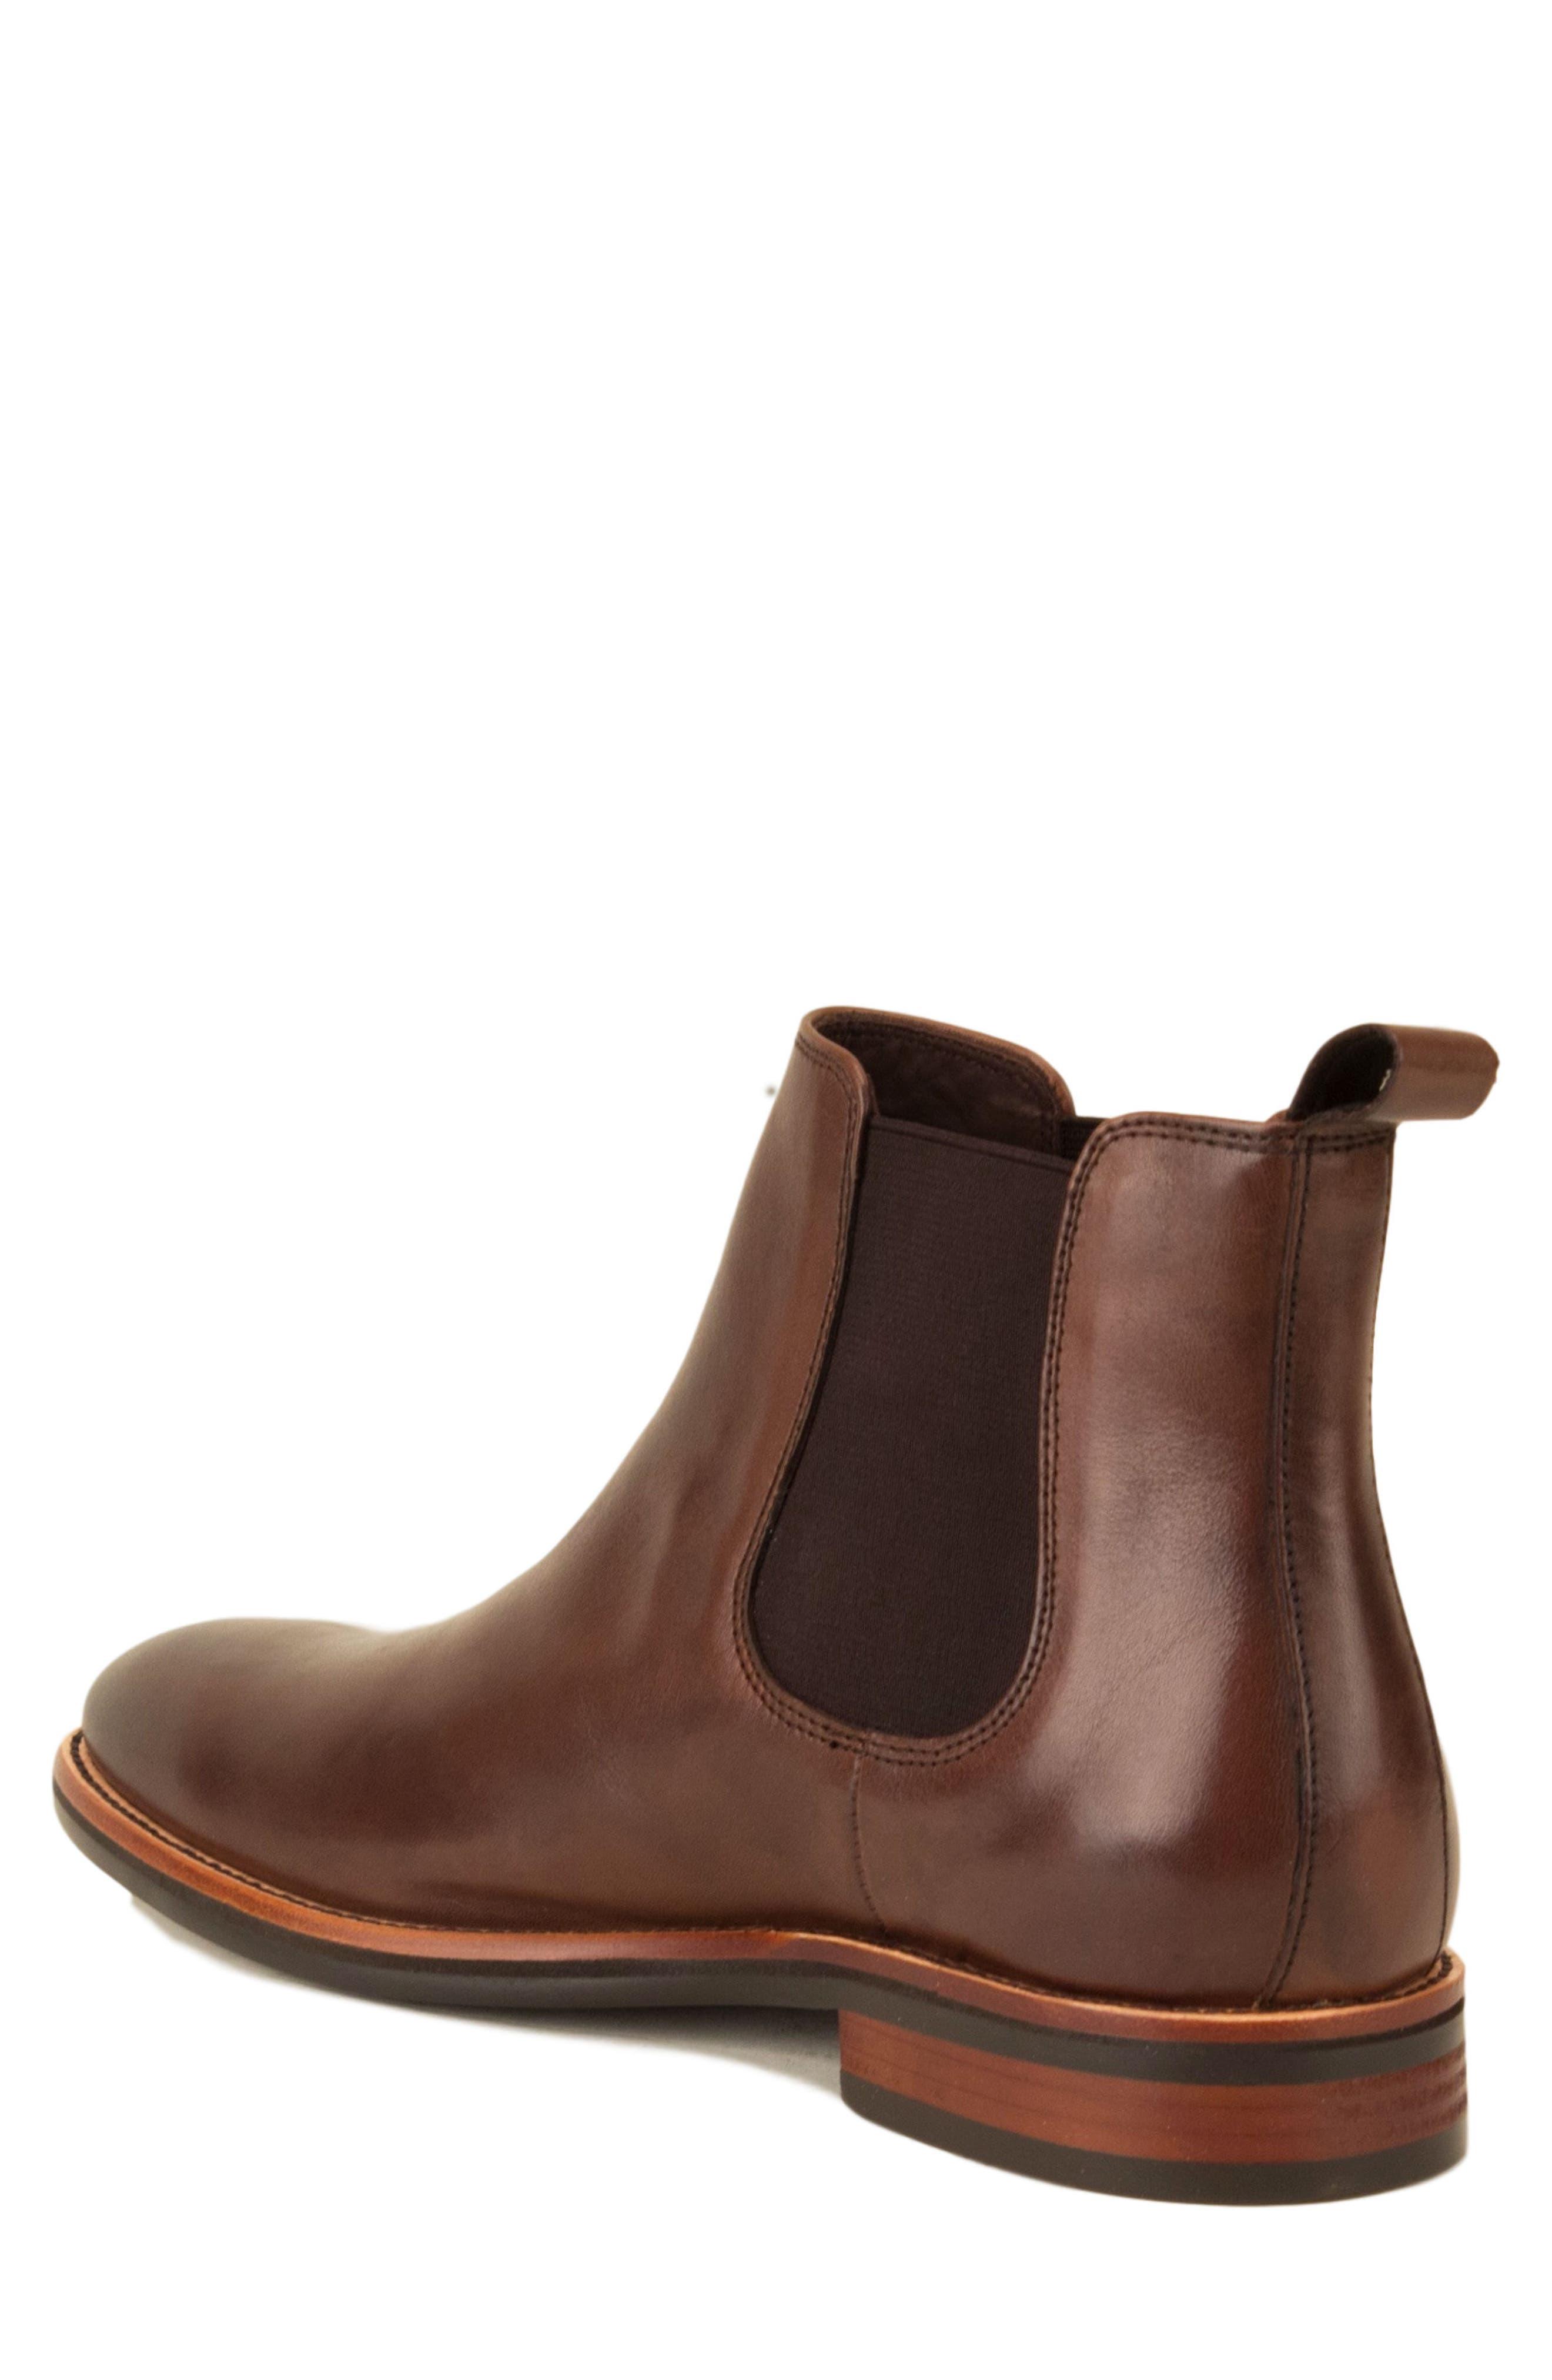 'Wallis' Chelsea Boot,                             Alternate thumbnail 2, color,                             217